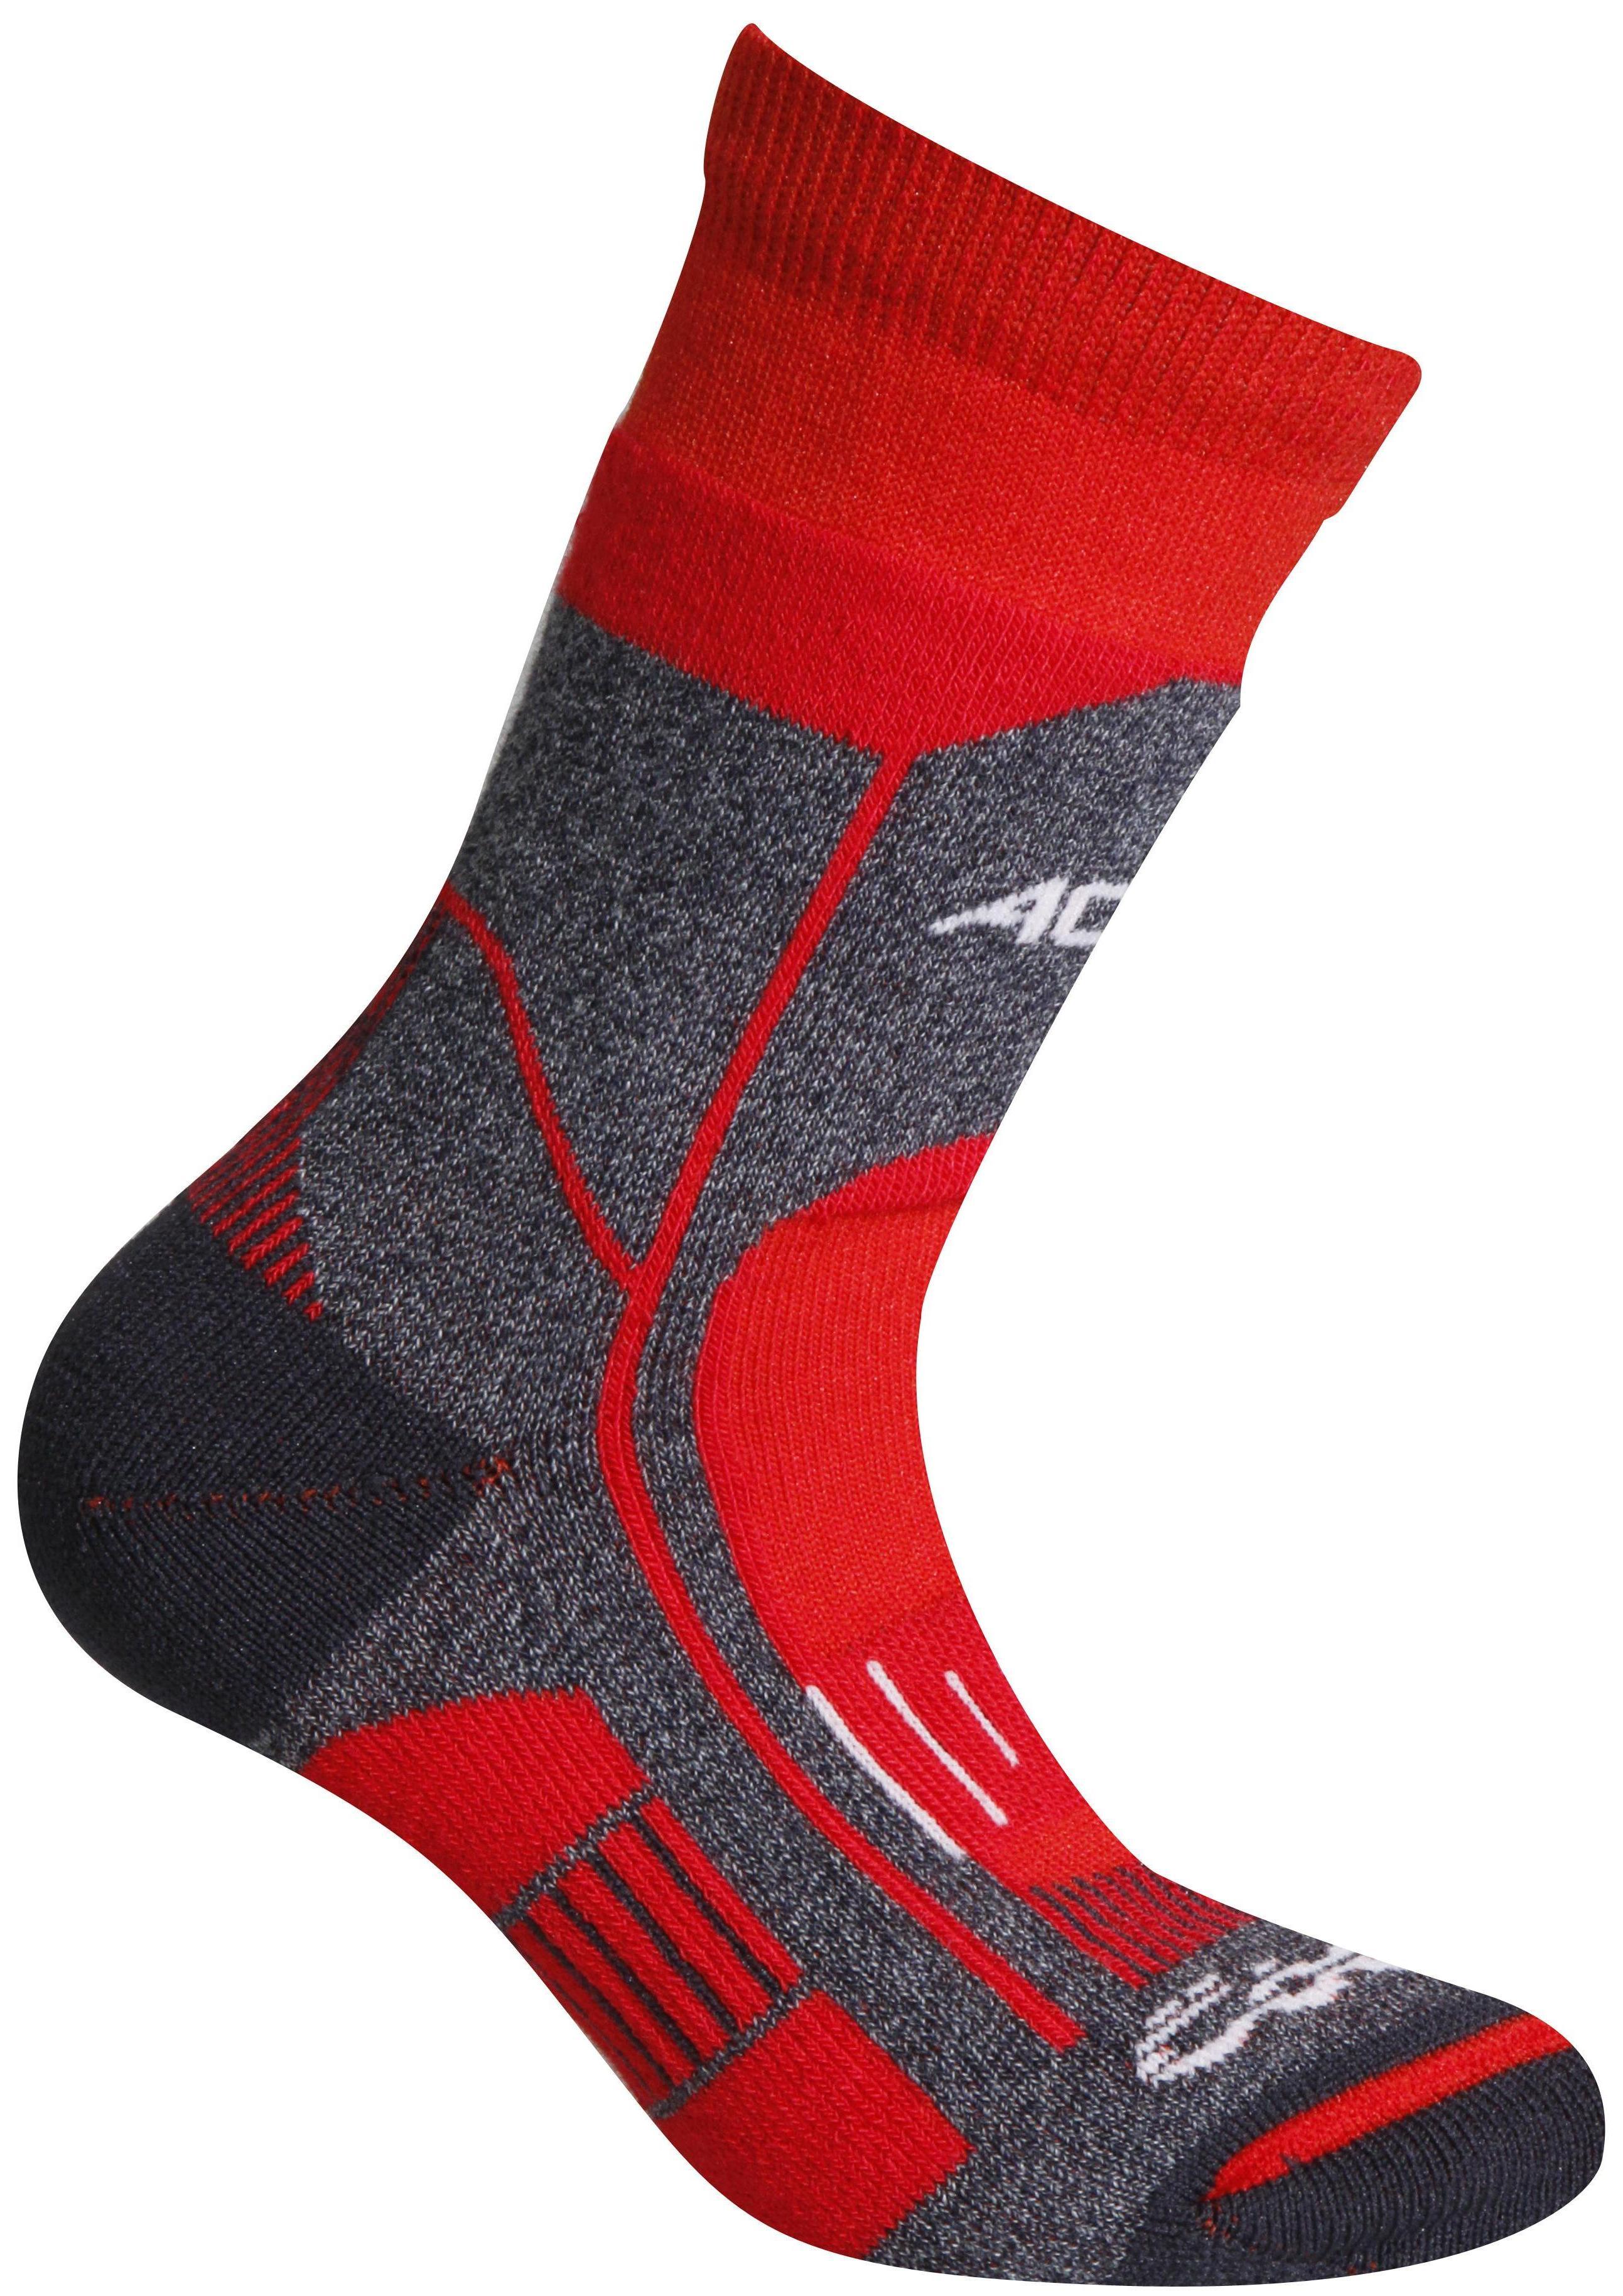 Носки Accapi Socks Trekking Ultralight Jr, black/red, 23-26 EU